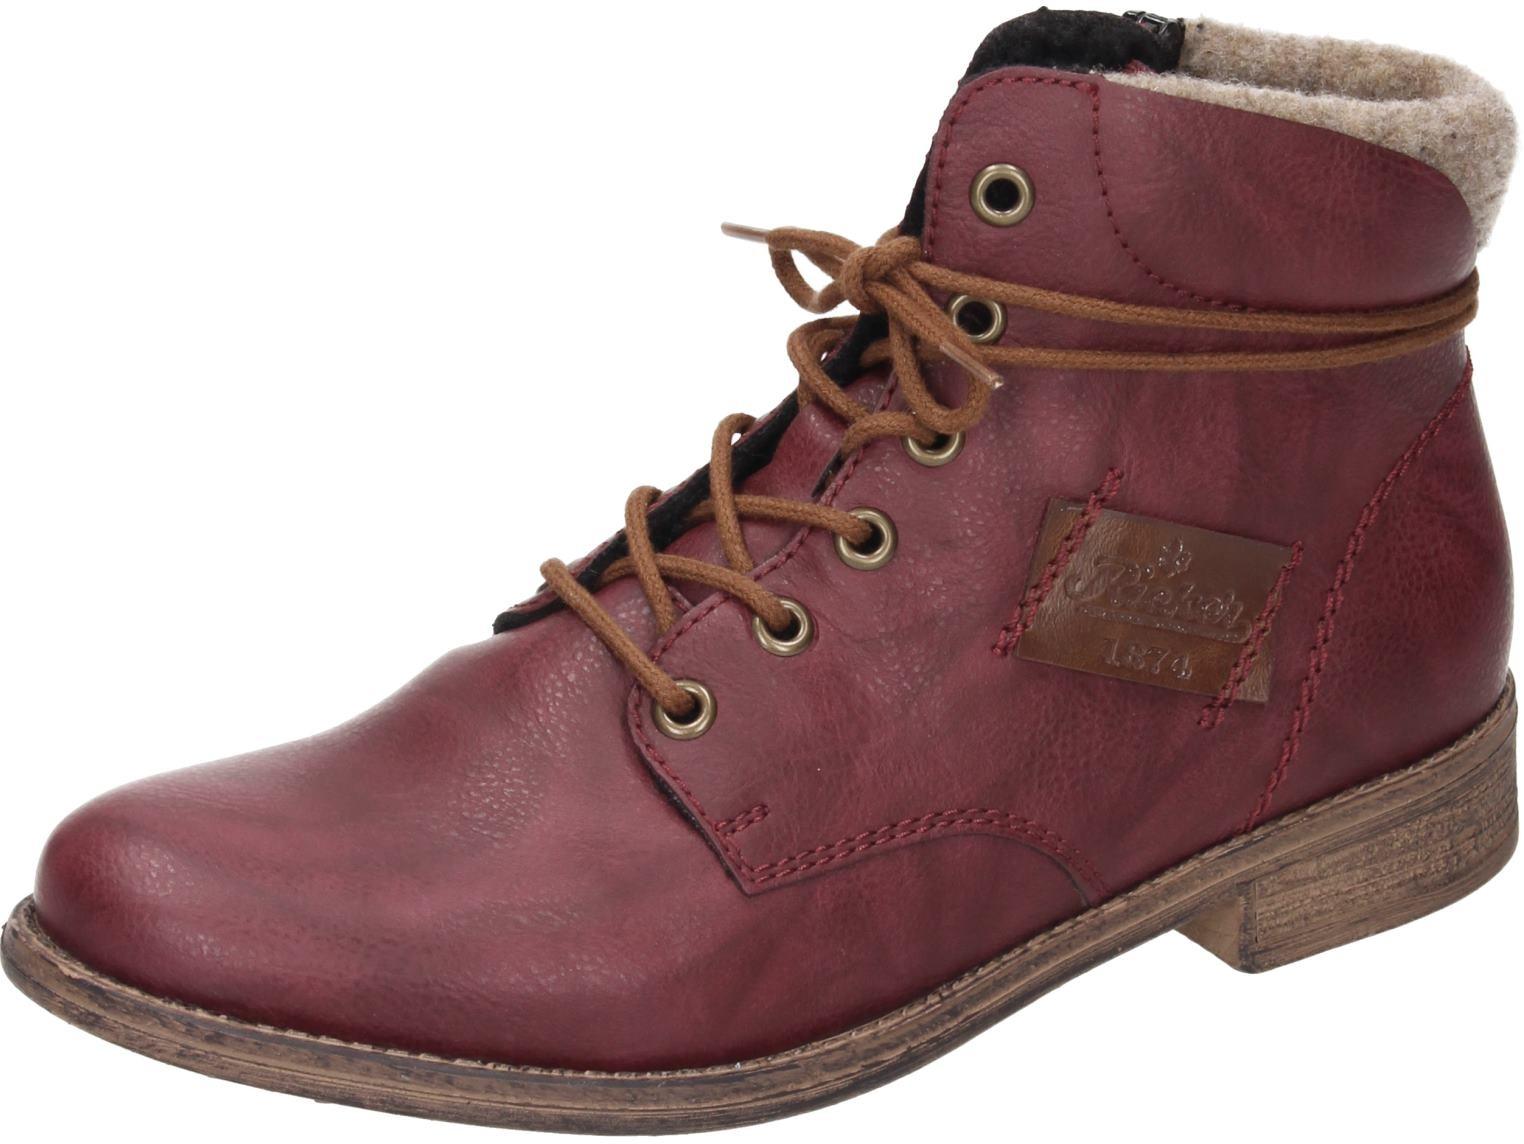 Rieker Damen Schuhe Damen-Stiefelette rot Synthetik NEU